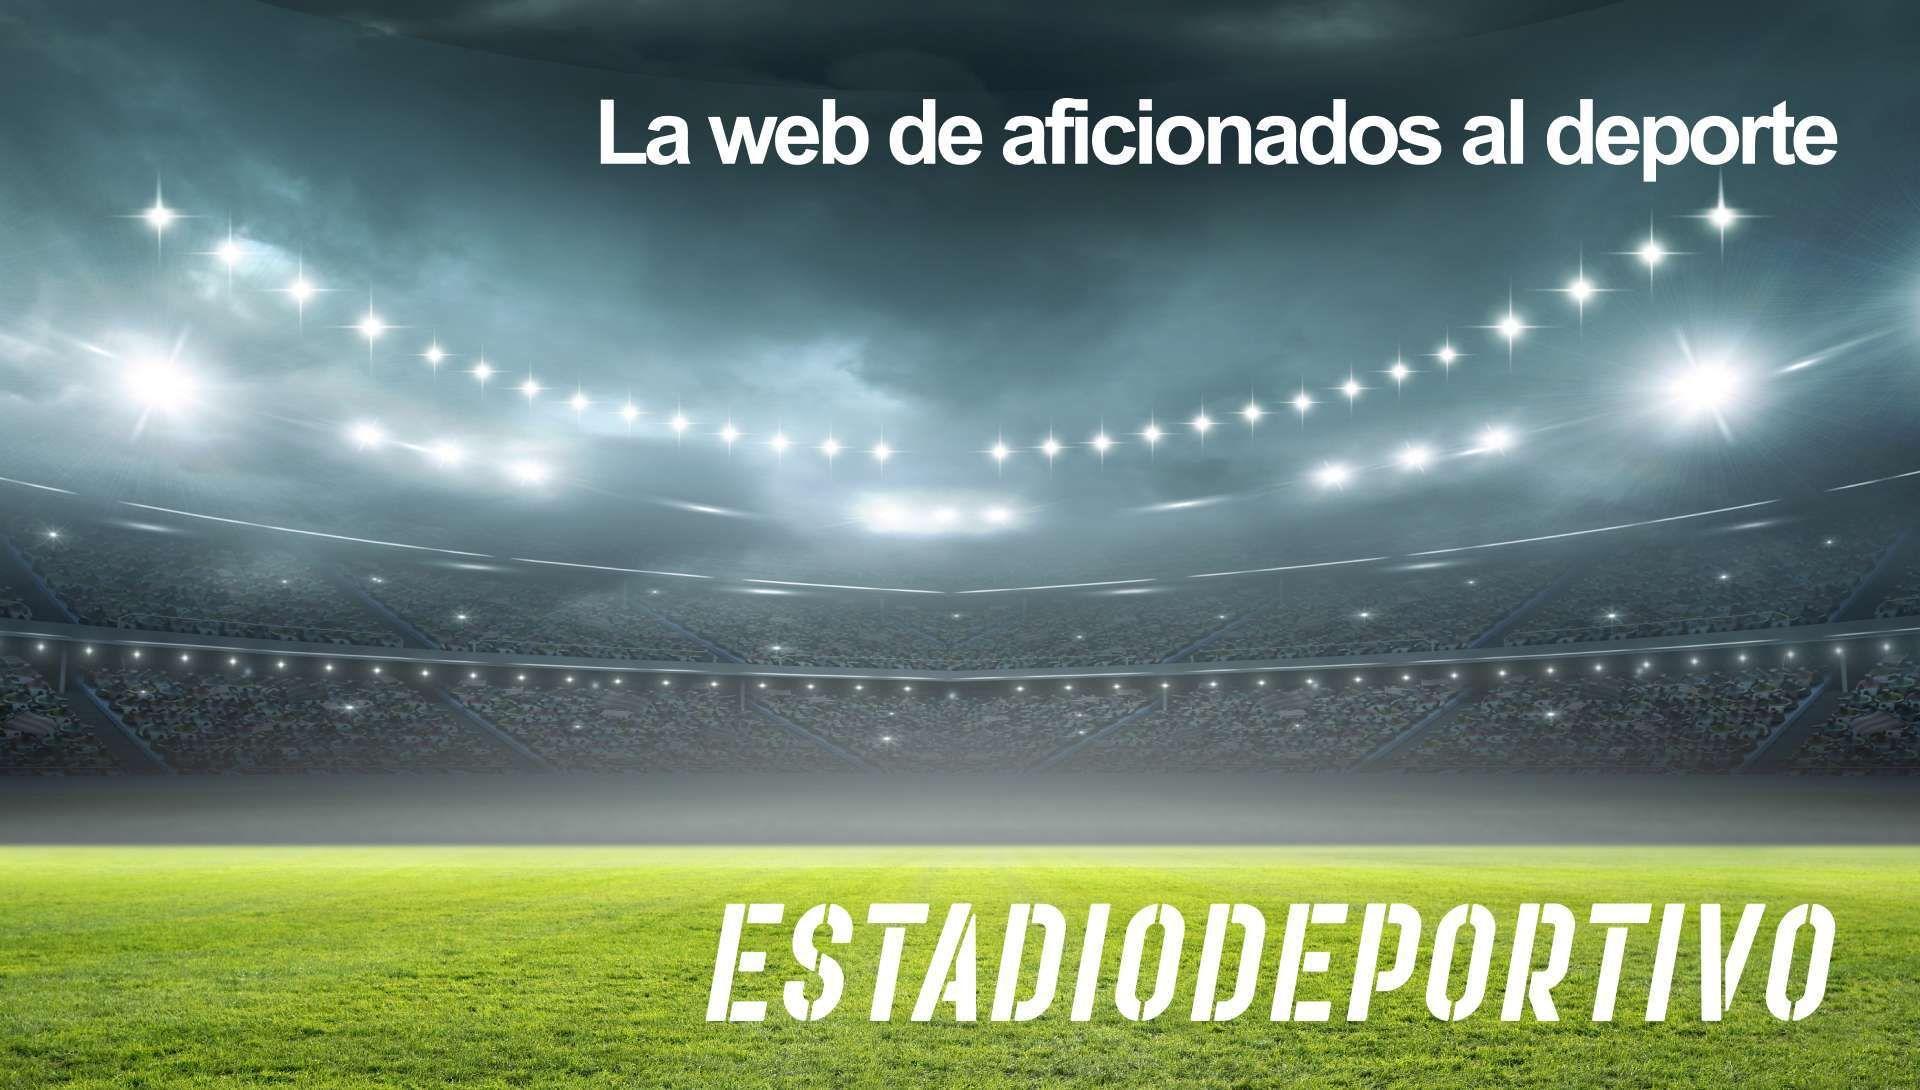 Rhian Sugden, la modelo que rechazó a Cristiano